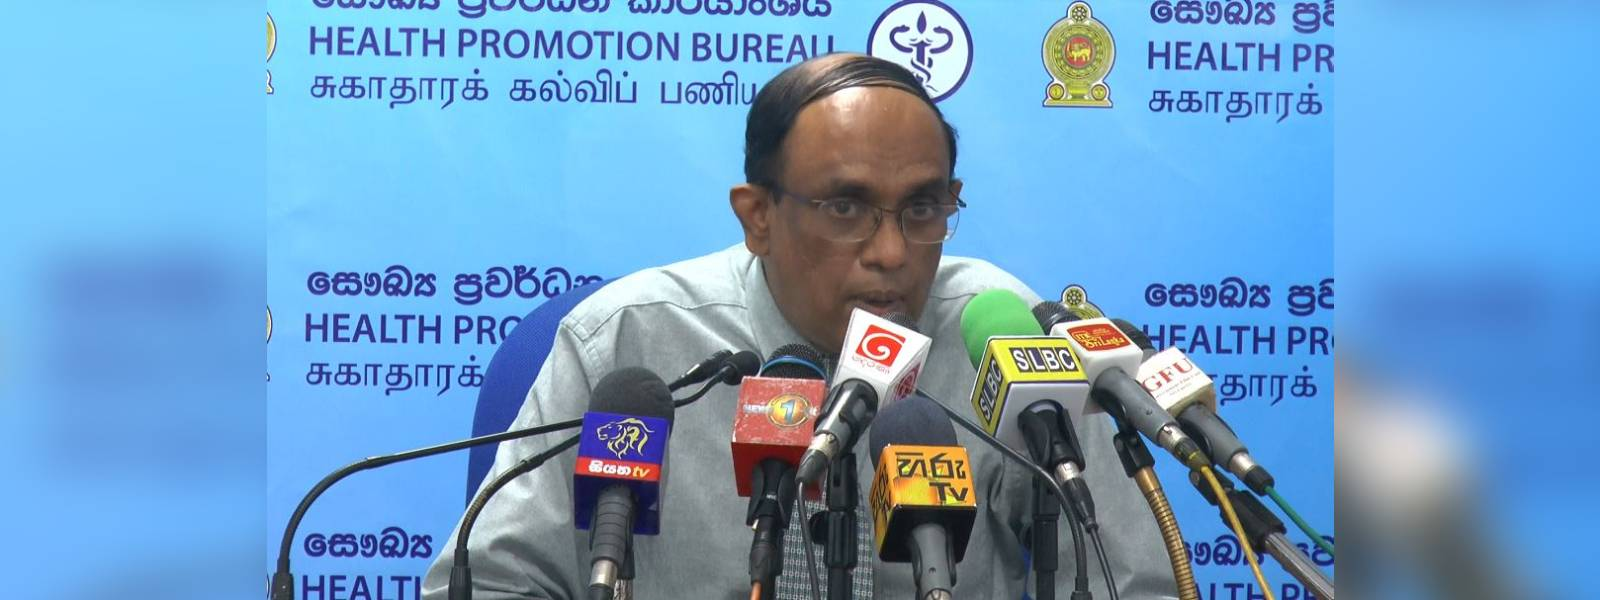 Sri Lanka at risk of malaria; health officials caution